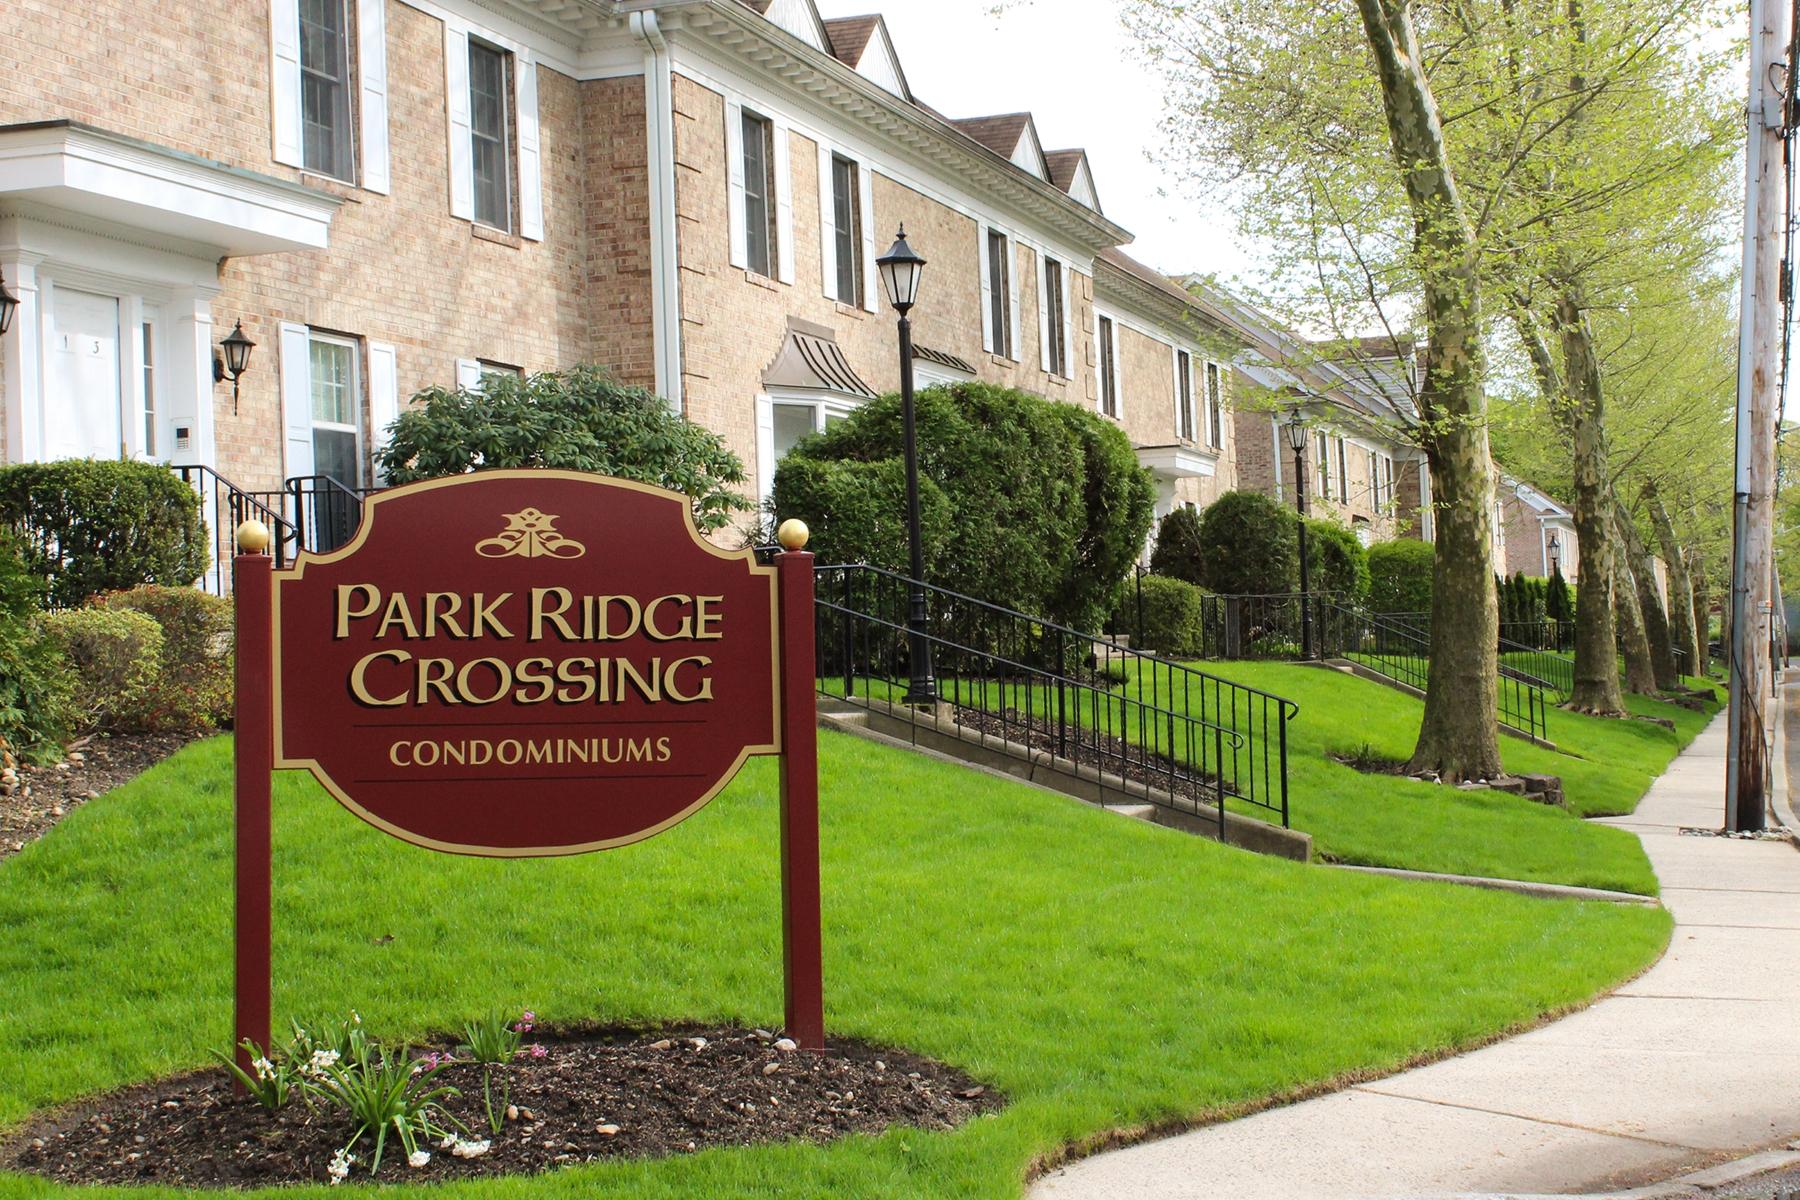 Condominiums للـ Sale في Park Ridge Crossing 129A S Maple Ave, Park Ridge, New Jersey 07656 United States